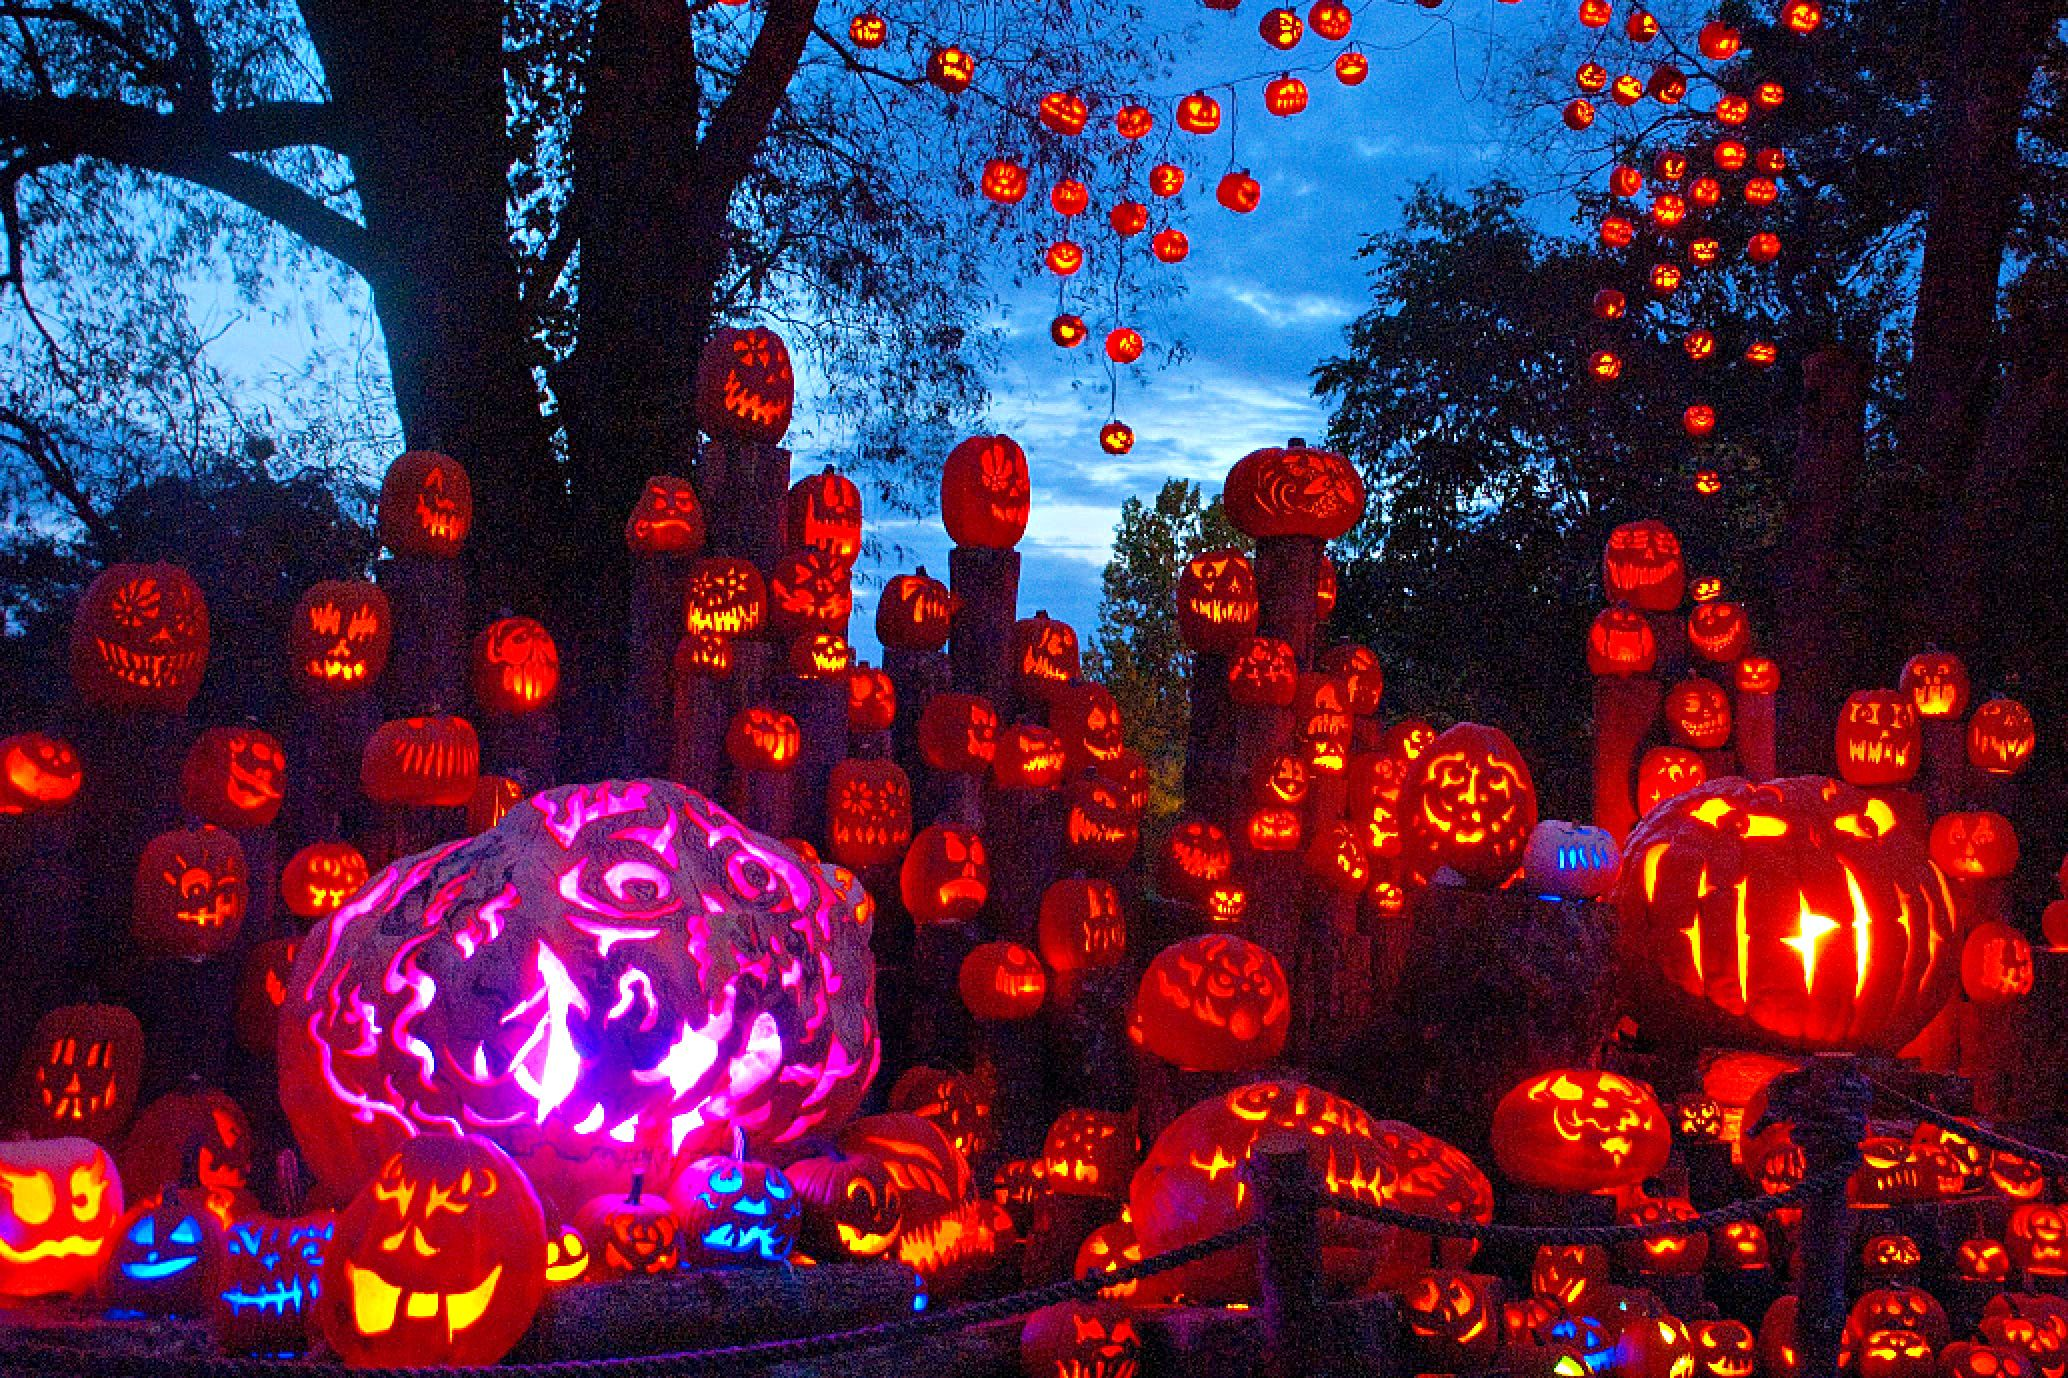 Lambertville Nj Halloween Pumpkins 2020 Pumpkin Festivals and Jack O' Lantern Displays in New England in